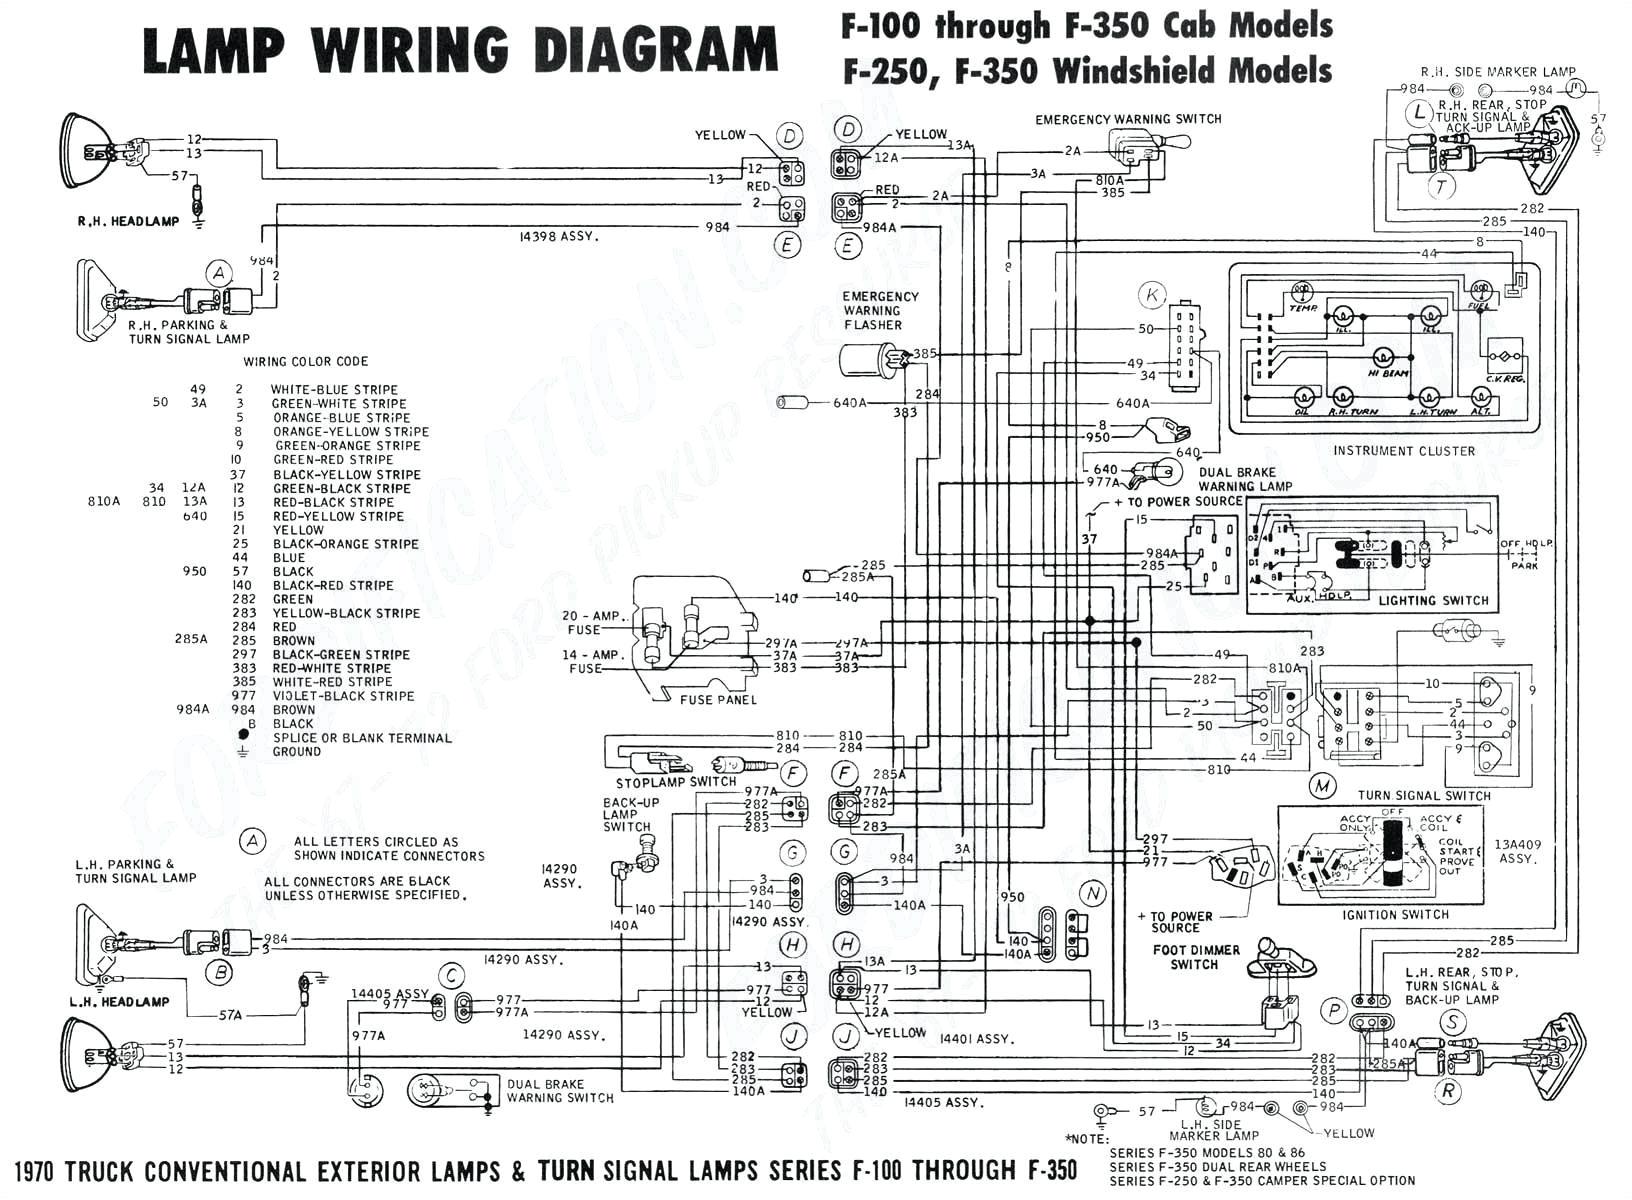 Snow Way Plow Wiring Diagram Snow Way Plow Wiring Diagram Fresh Snow Plow Wiring Diagram New Snow